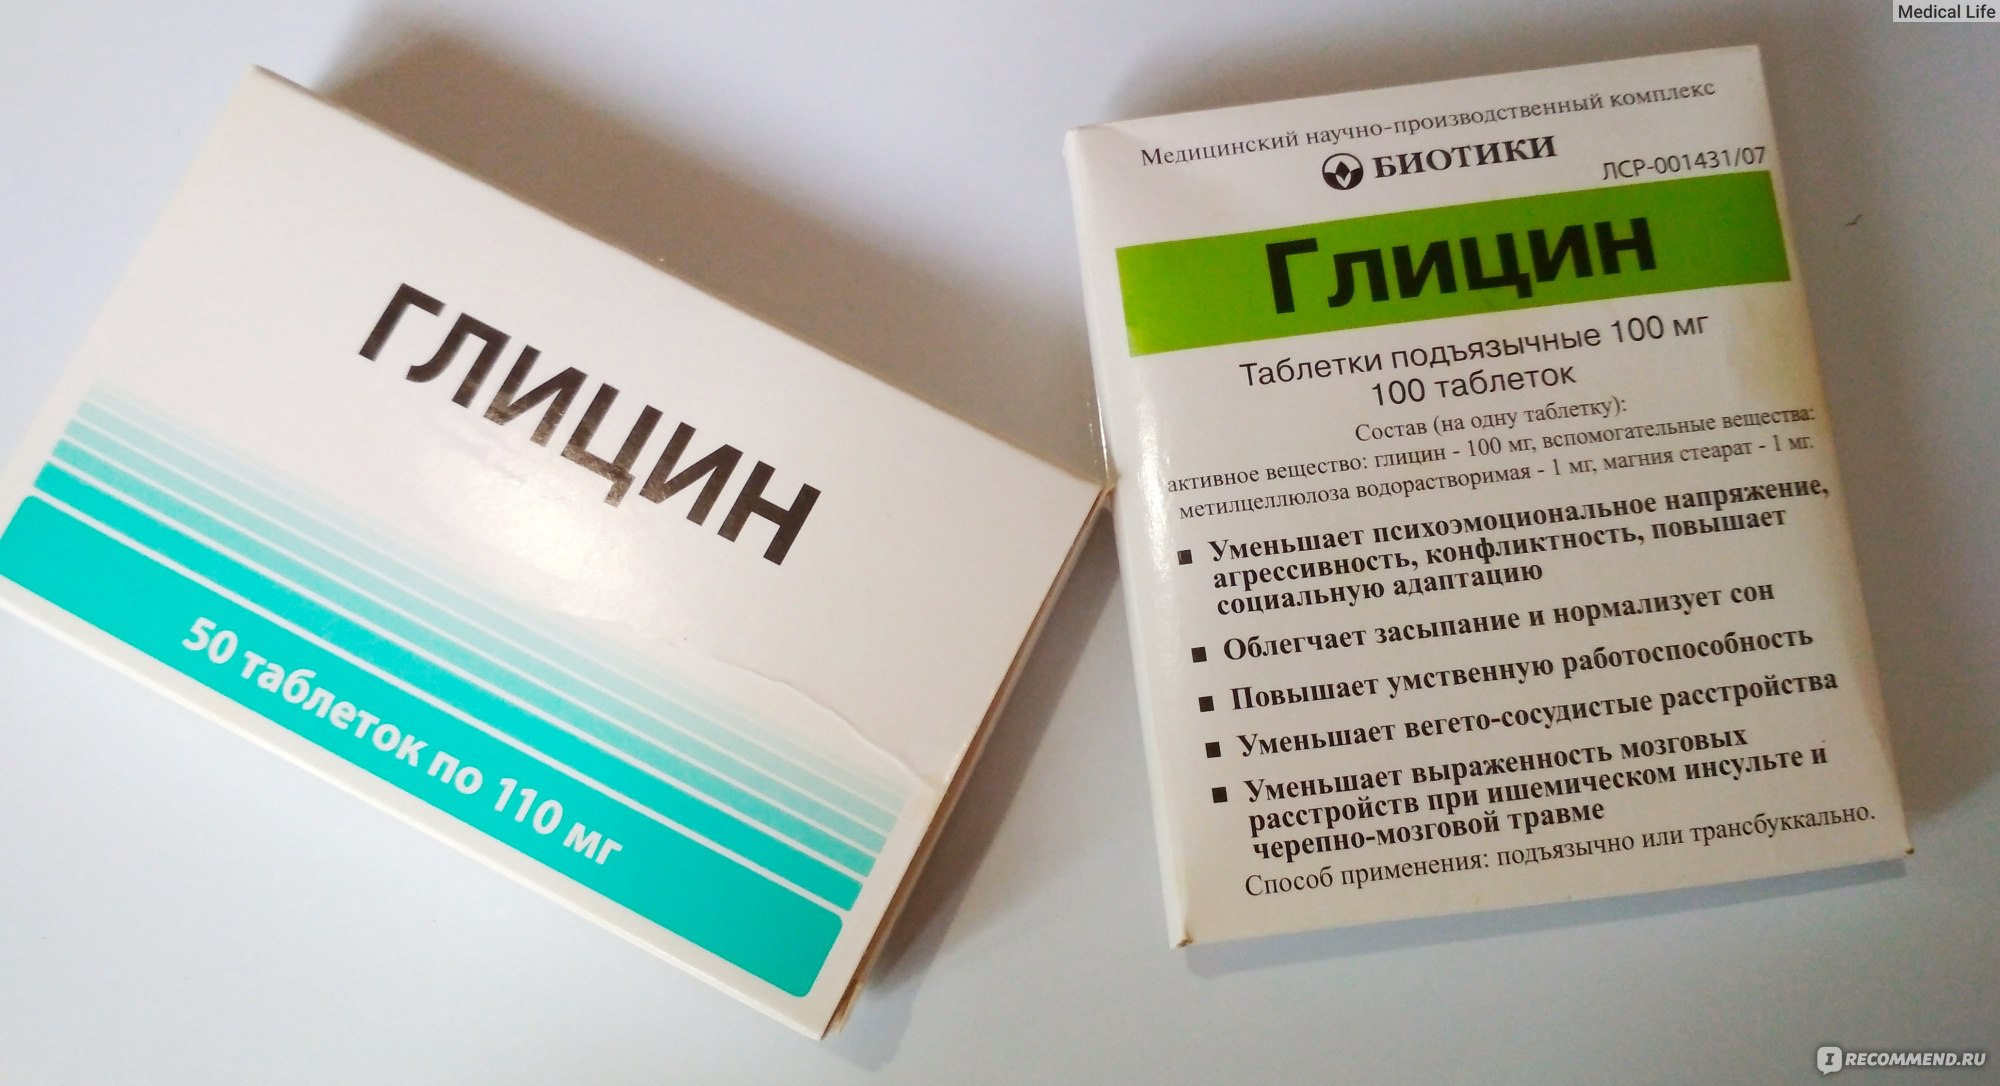 Глицин — аминокислота, избавляющая от стрессов